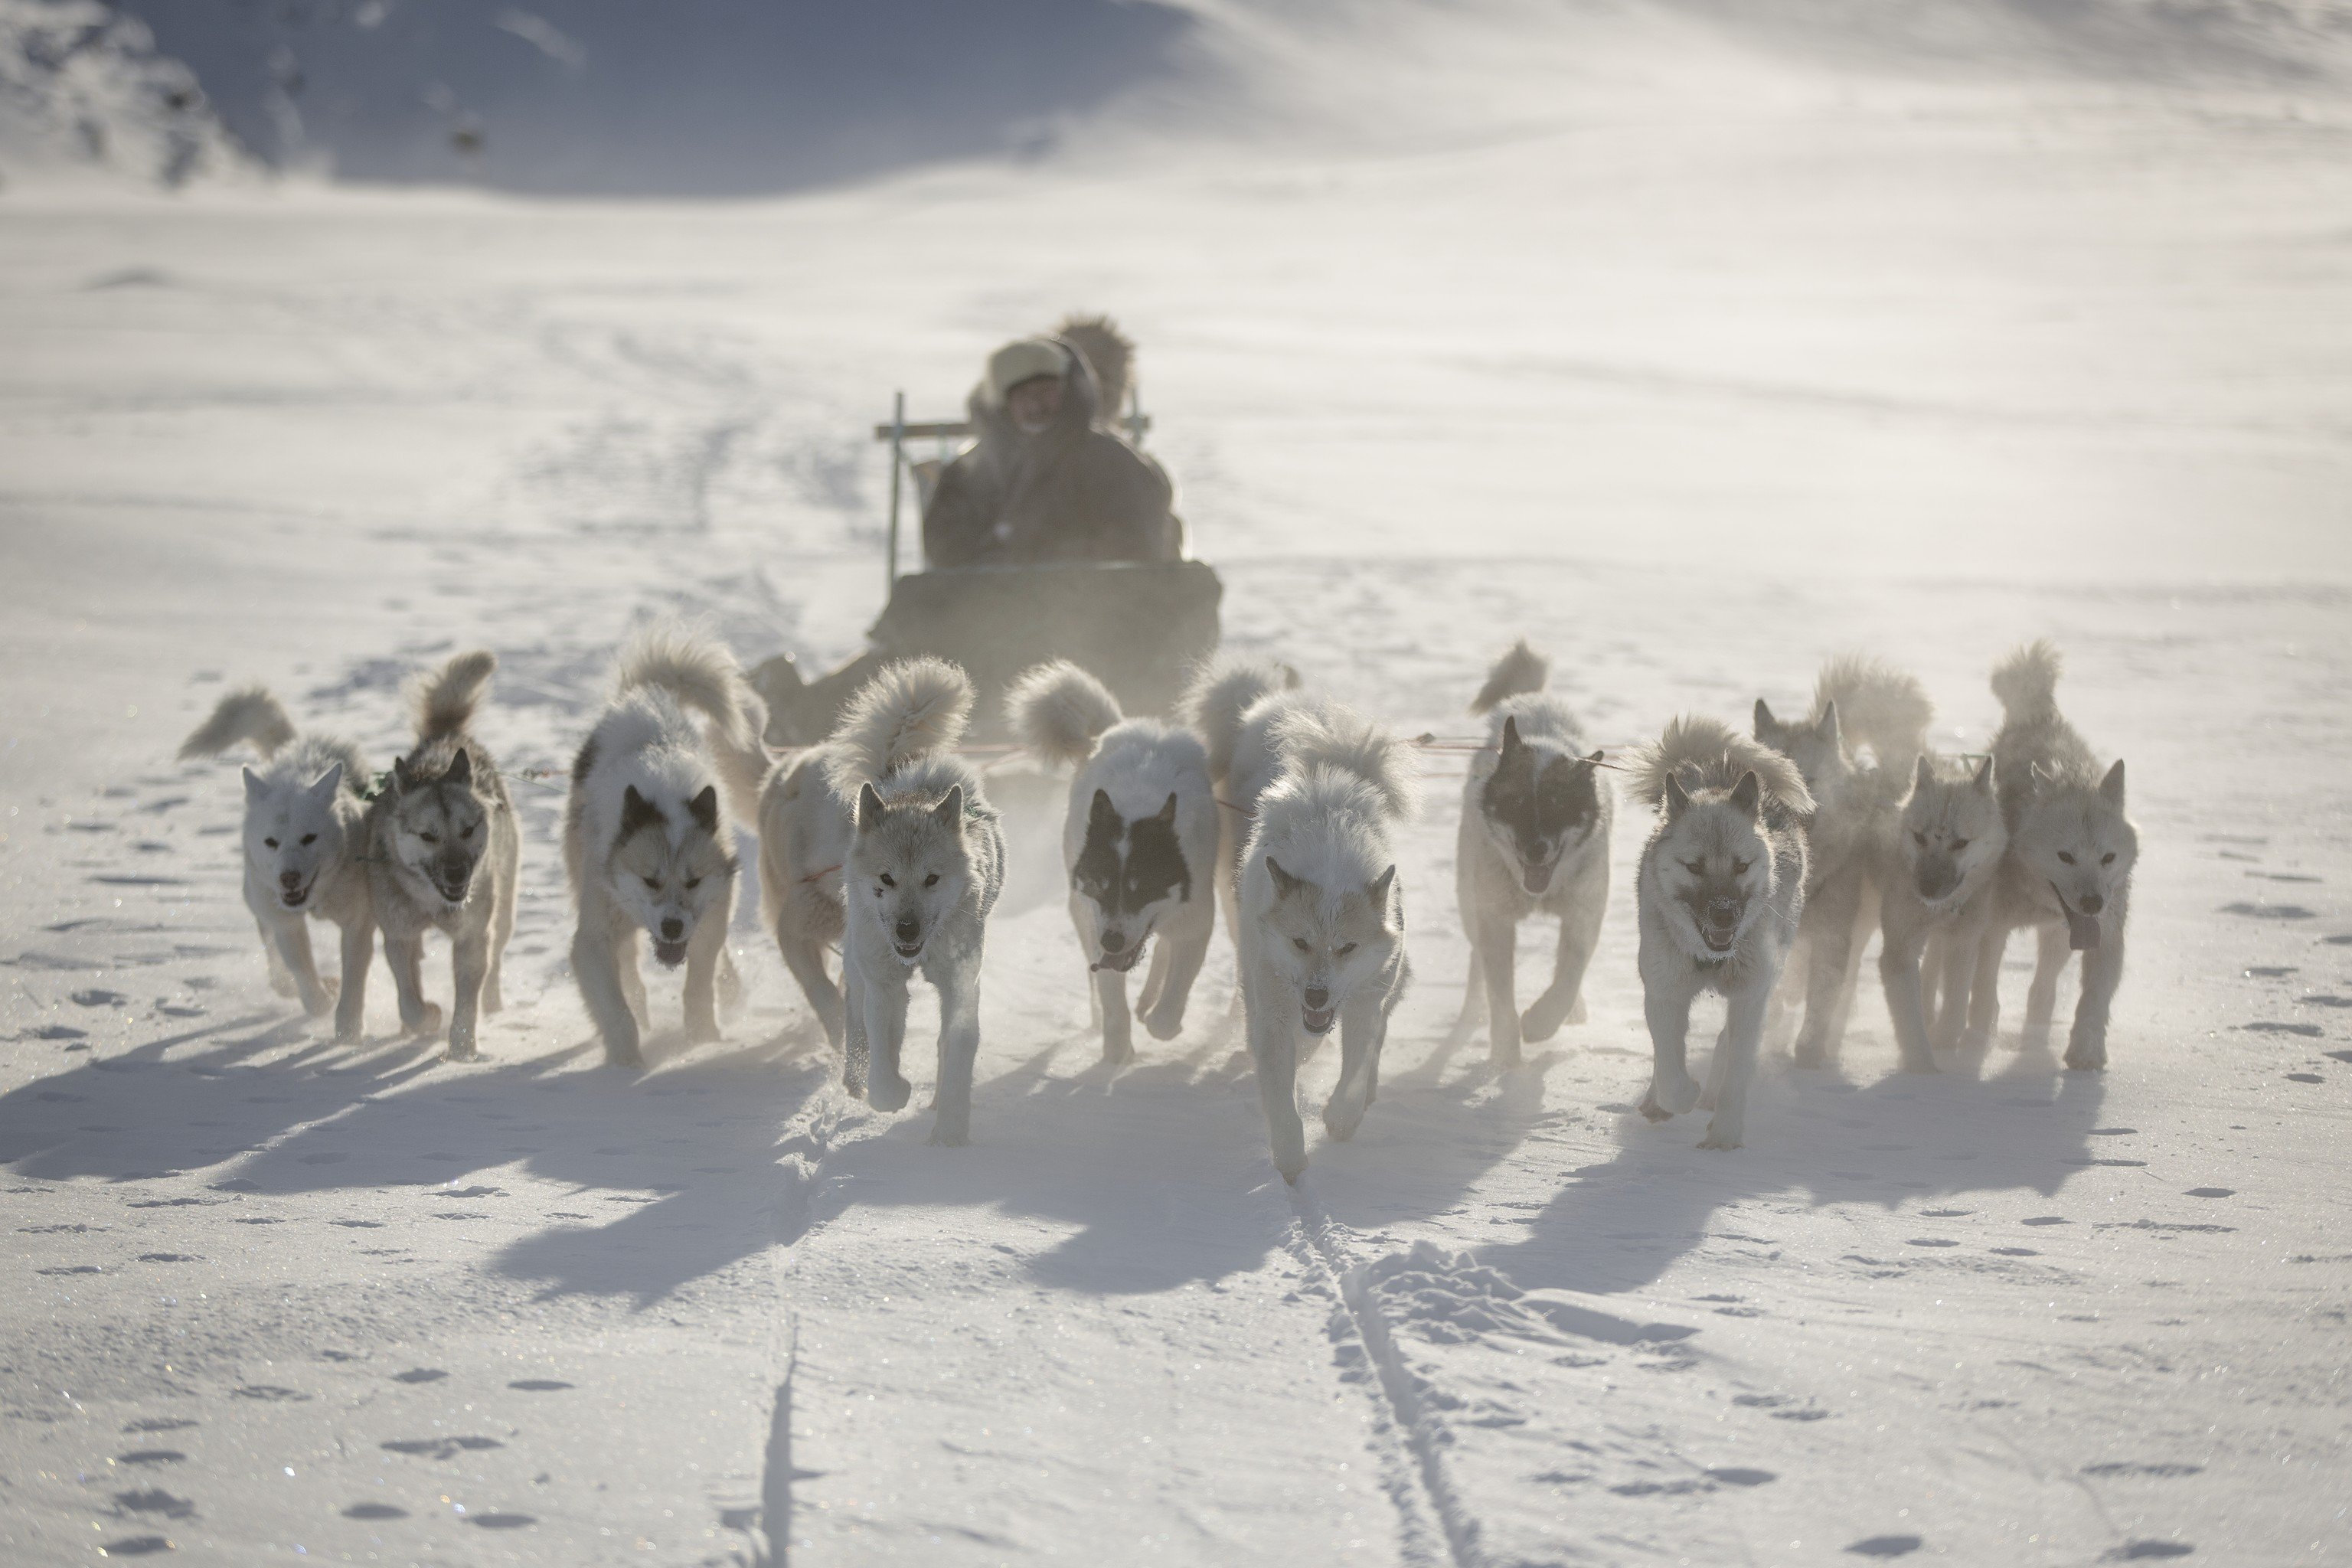 Trip Ideas outdoor snow Dog mammal dog sled mushing vehicle sled dog racing Winter group dog like mammal animal sports sandy